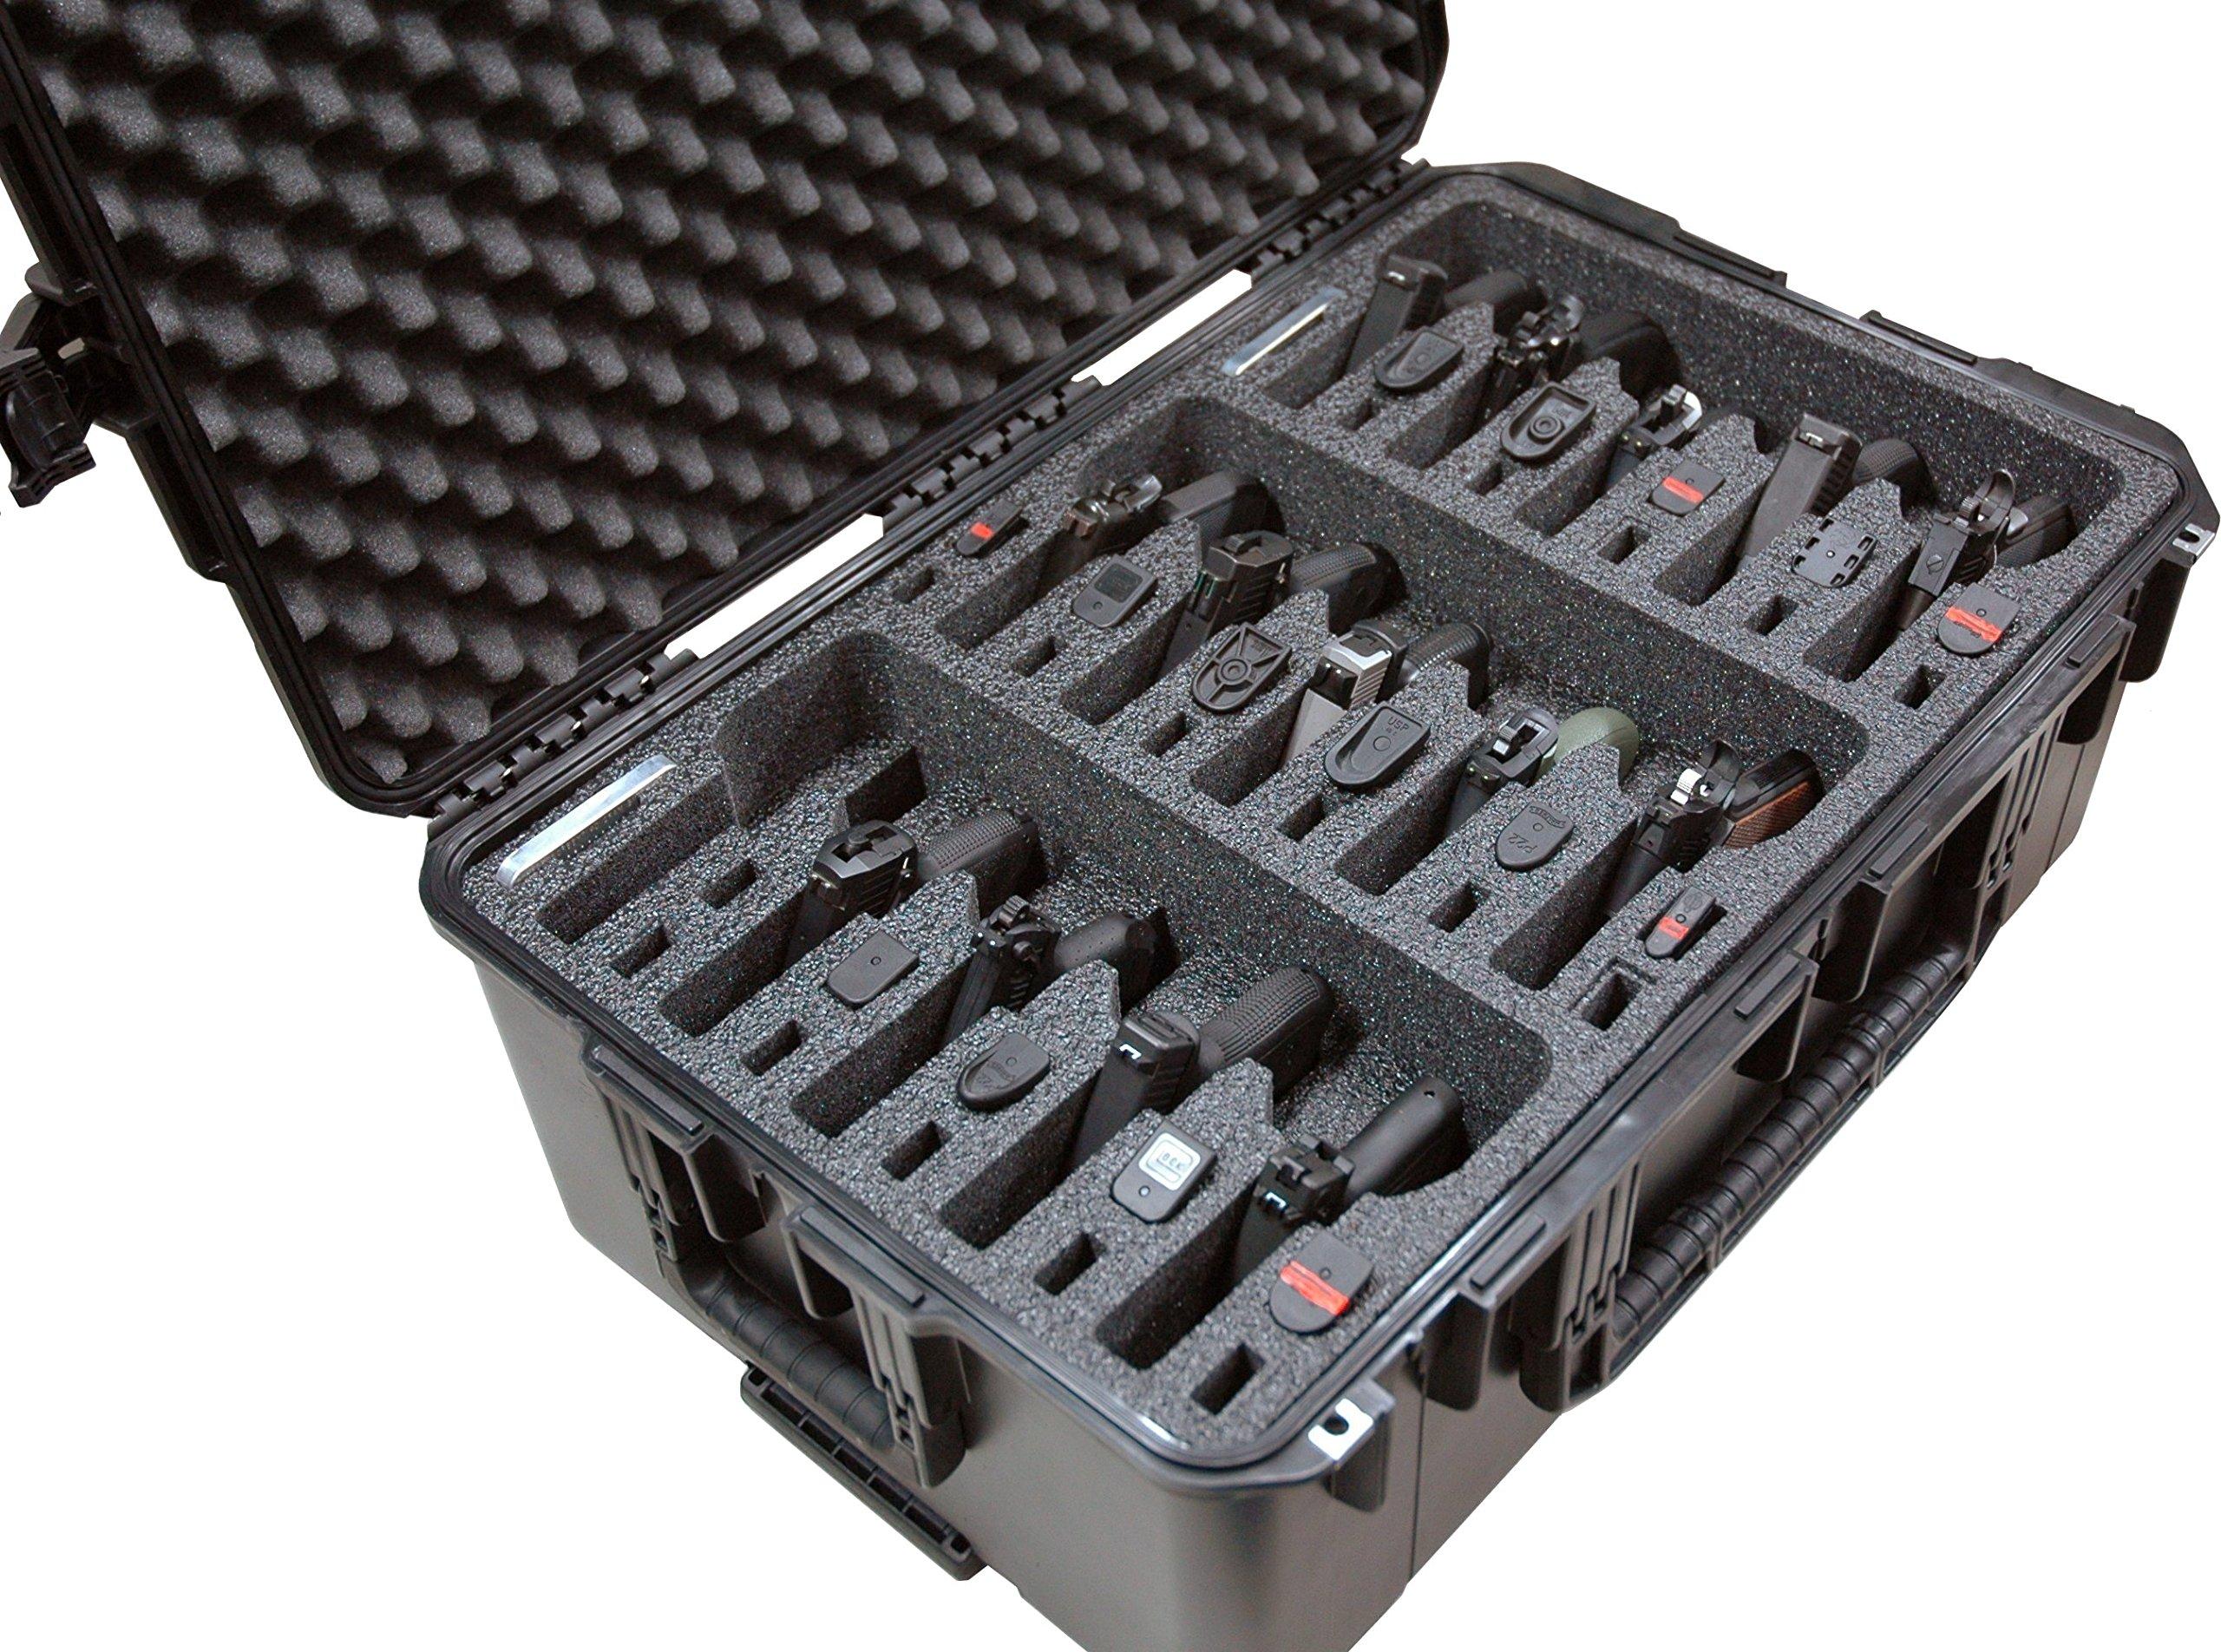 Case Club Waterproof 15 Pistol Case with Silica Gel